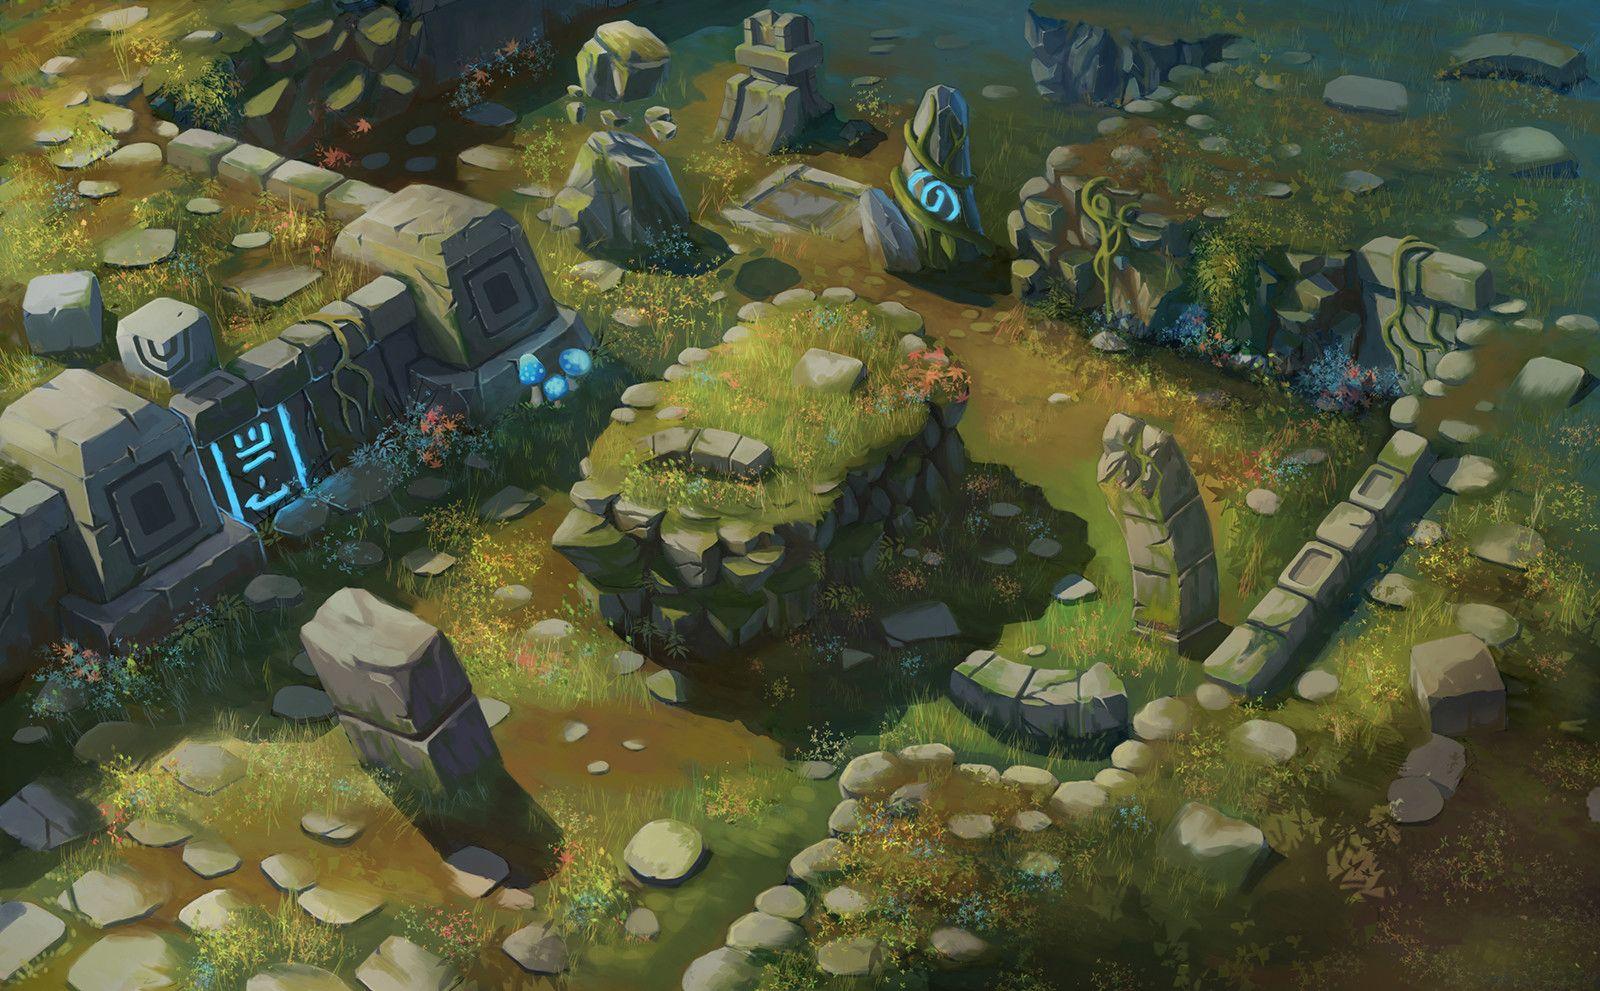 adf35c31391d6 ゲームヴィルジャパン、新作王国繁栄謳歌RPG『キングダムオブウォー』を配信開始 実写風美麗グラフィックで描かれる本格ハイファンタジーRPG!